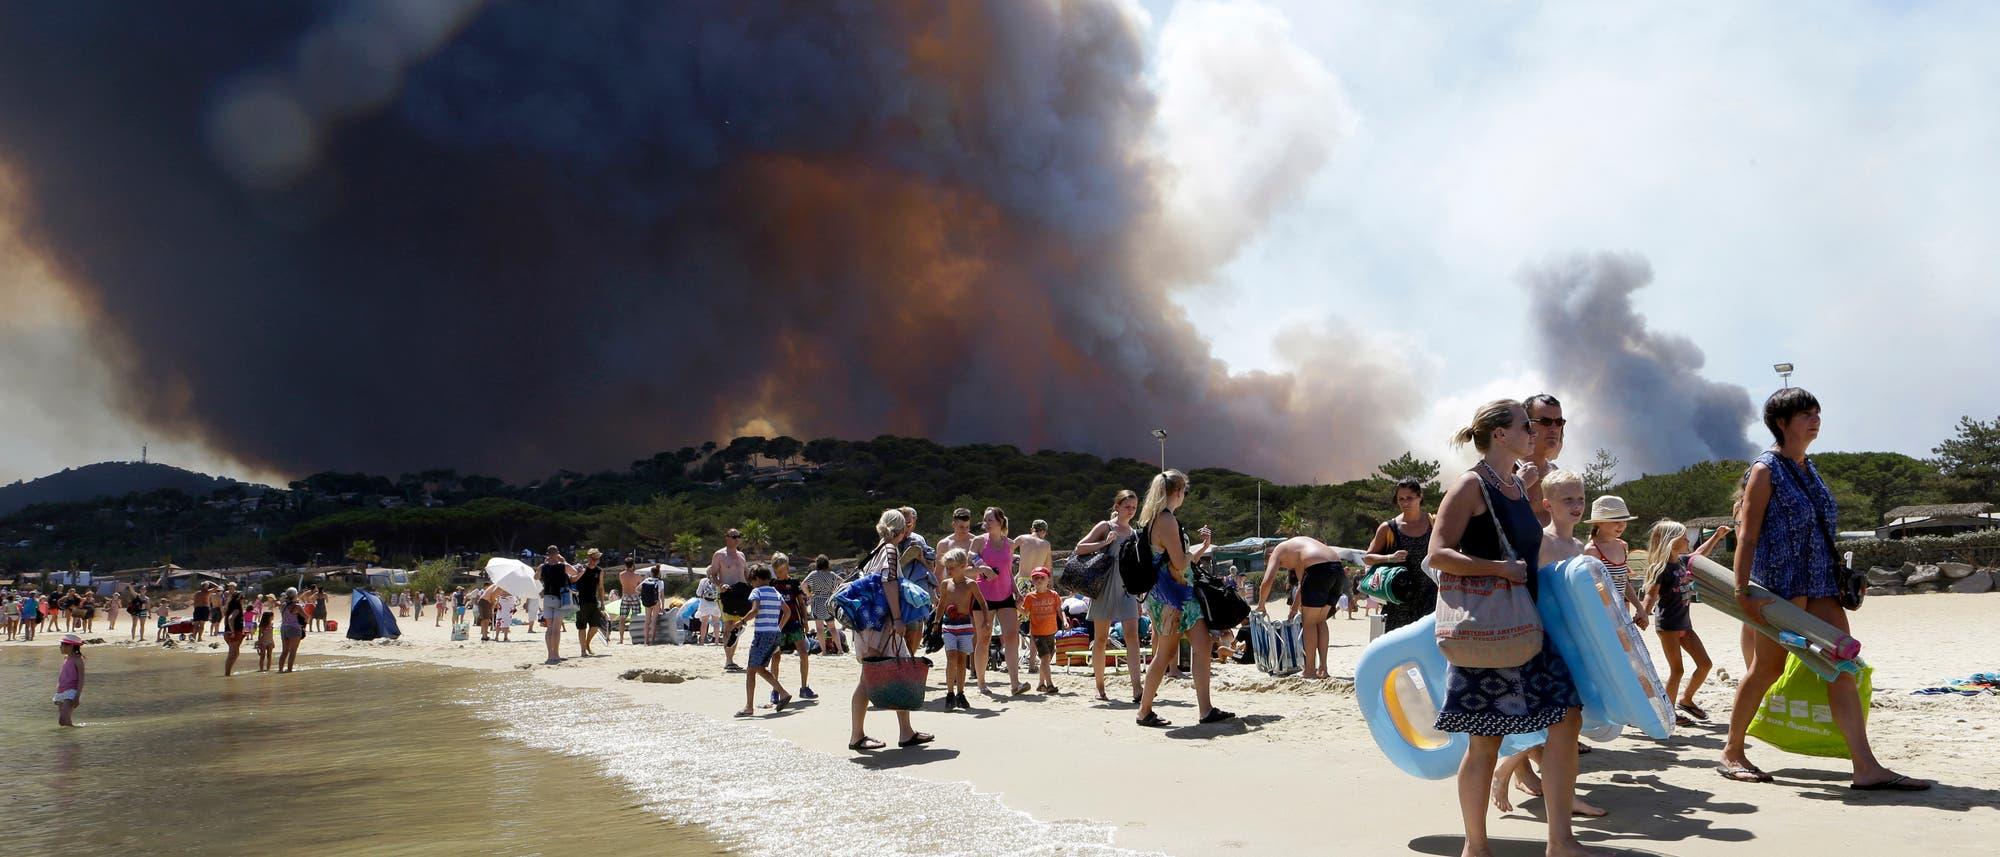 Waldbrand hinterm Strand